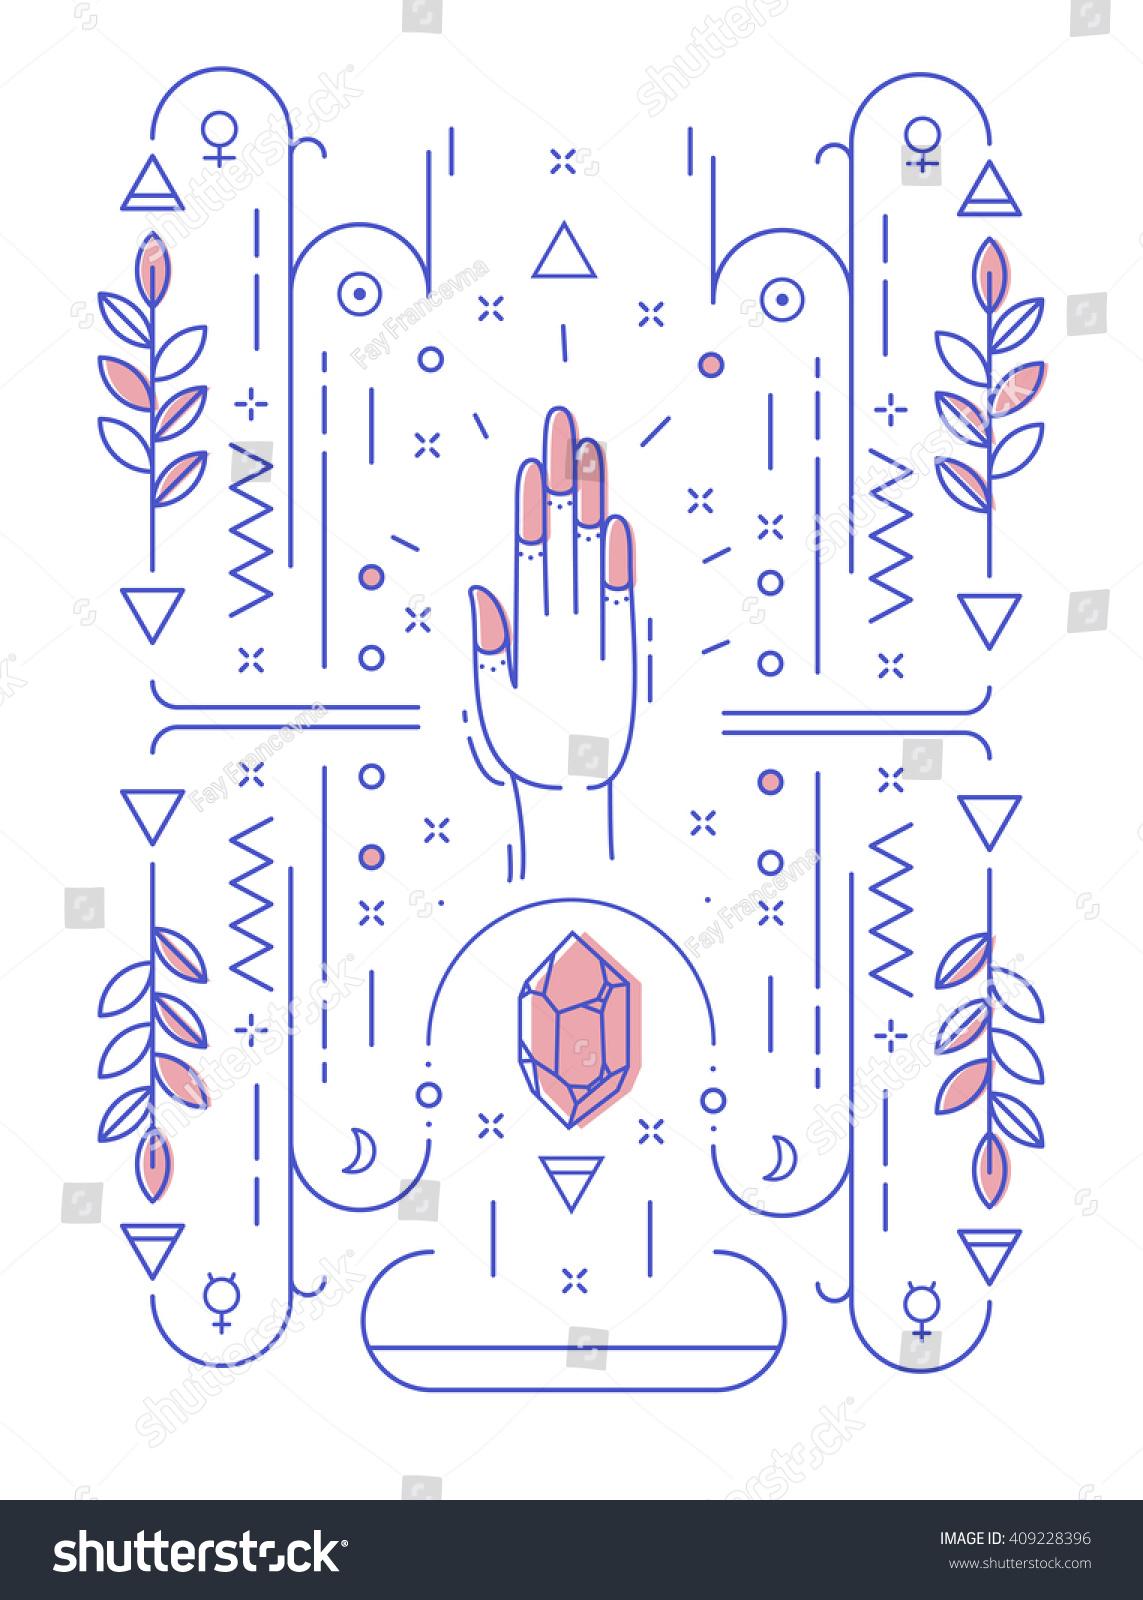 Abstract illustration geometric symbols hand no stock vector abstract illustration with geometric symbols and hand no hidden meaning biocorpaavc